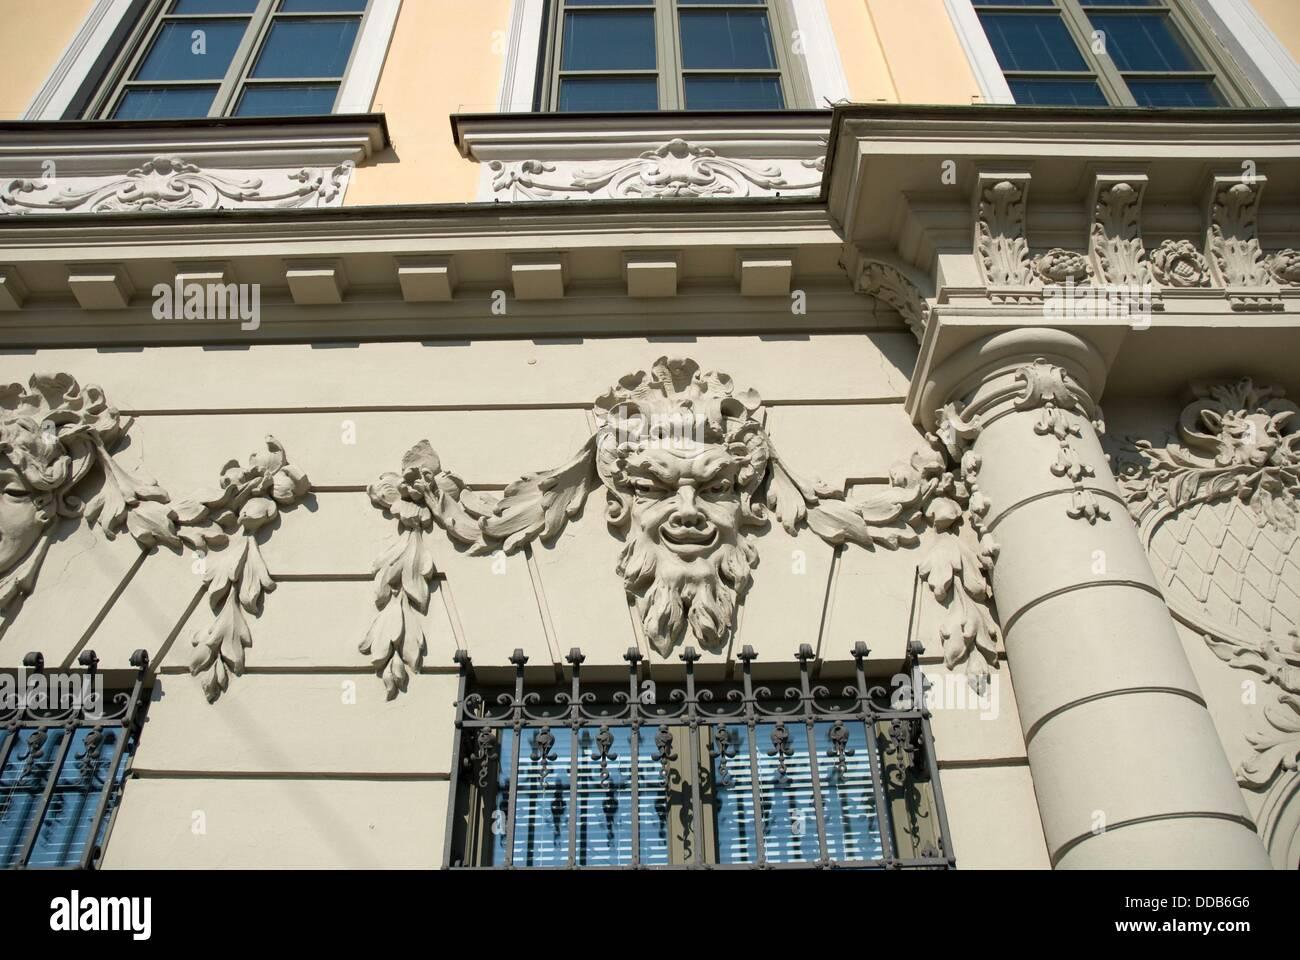 Barocke Fassade eines Stadthauses in Augsburg Stockfoto